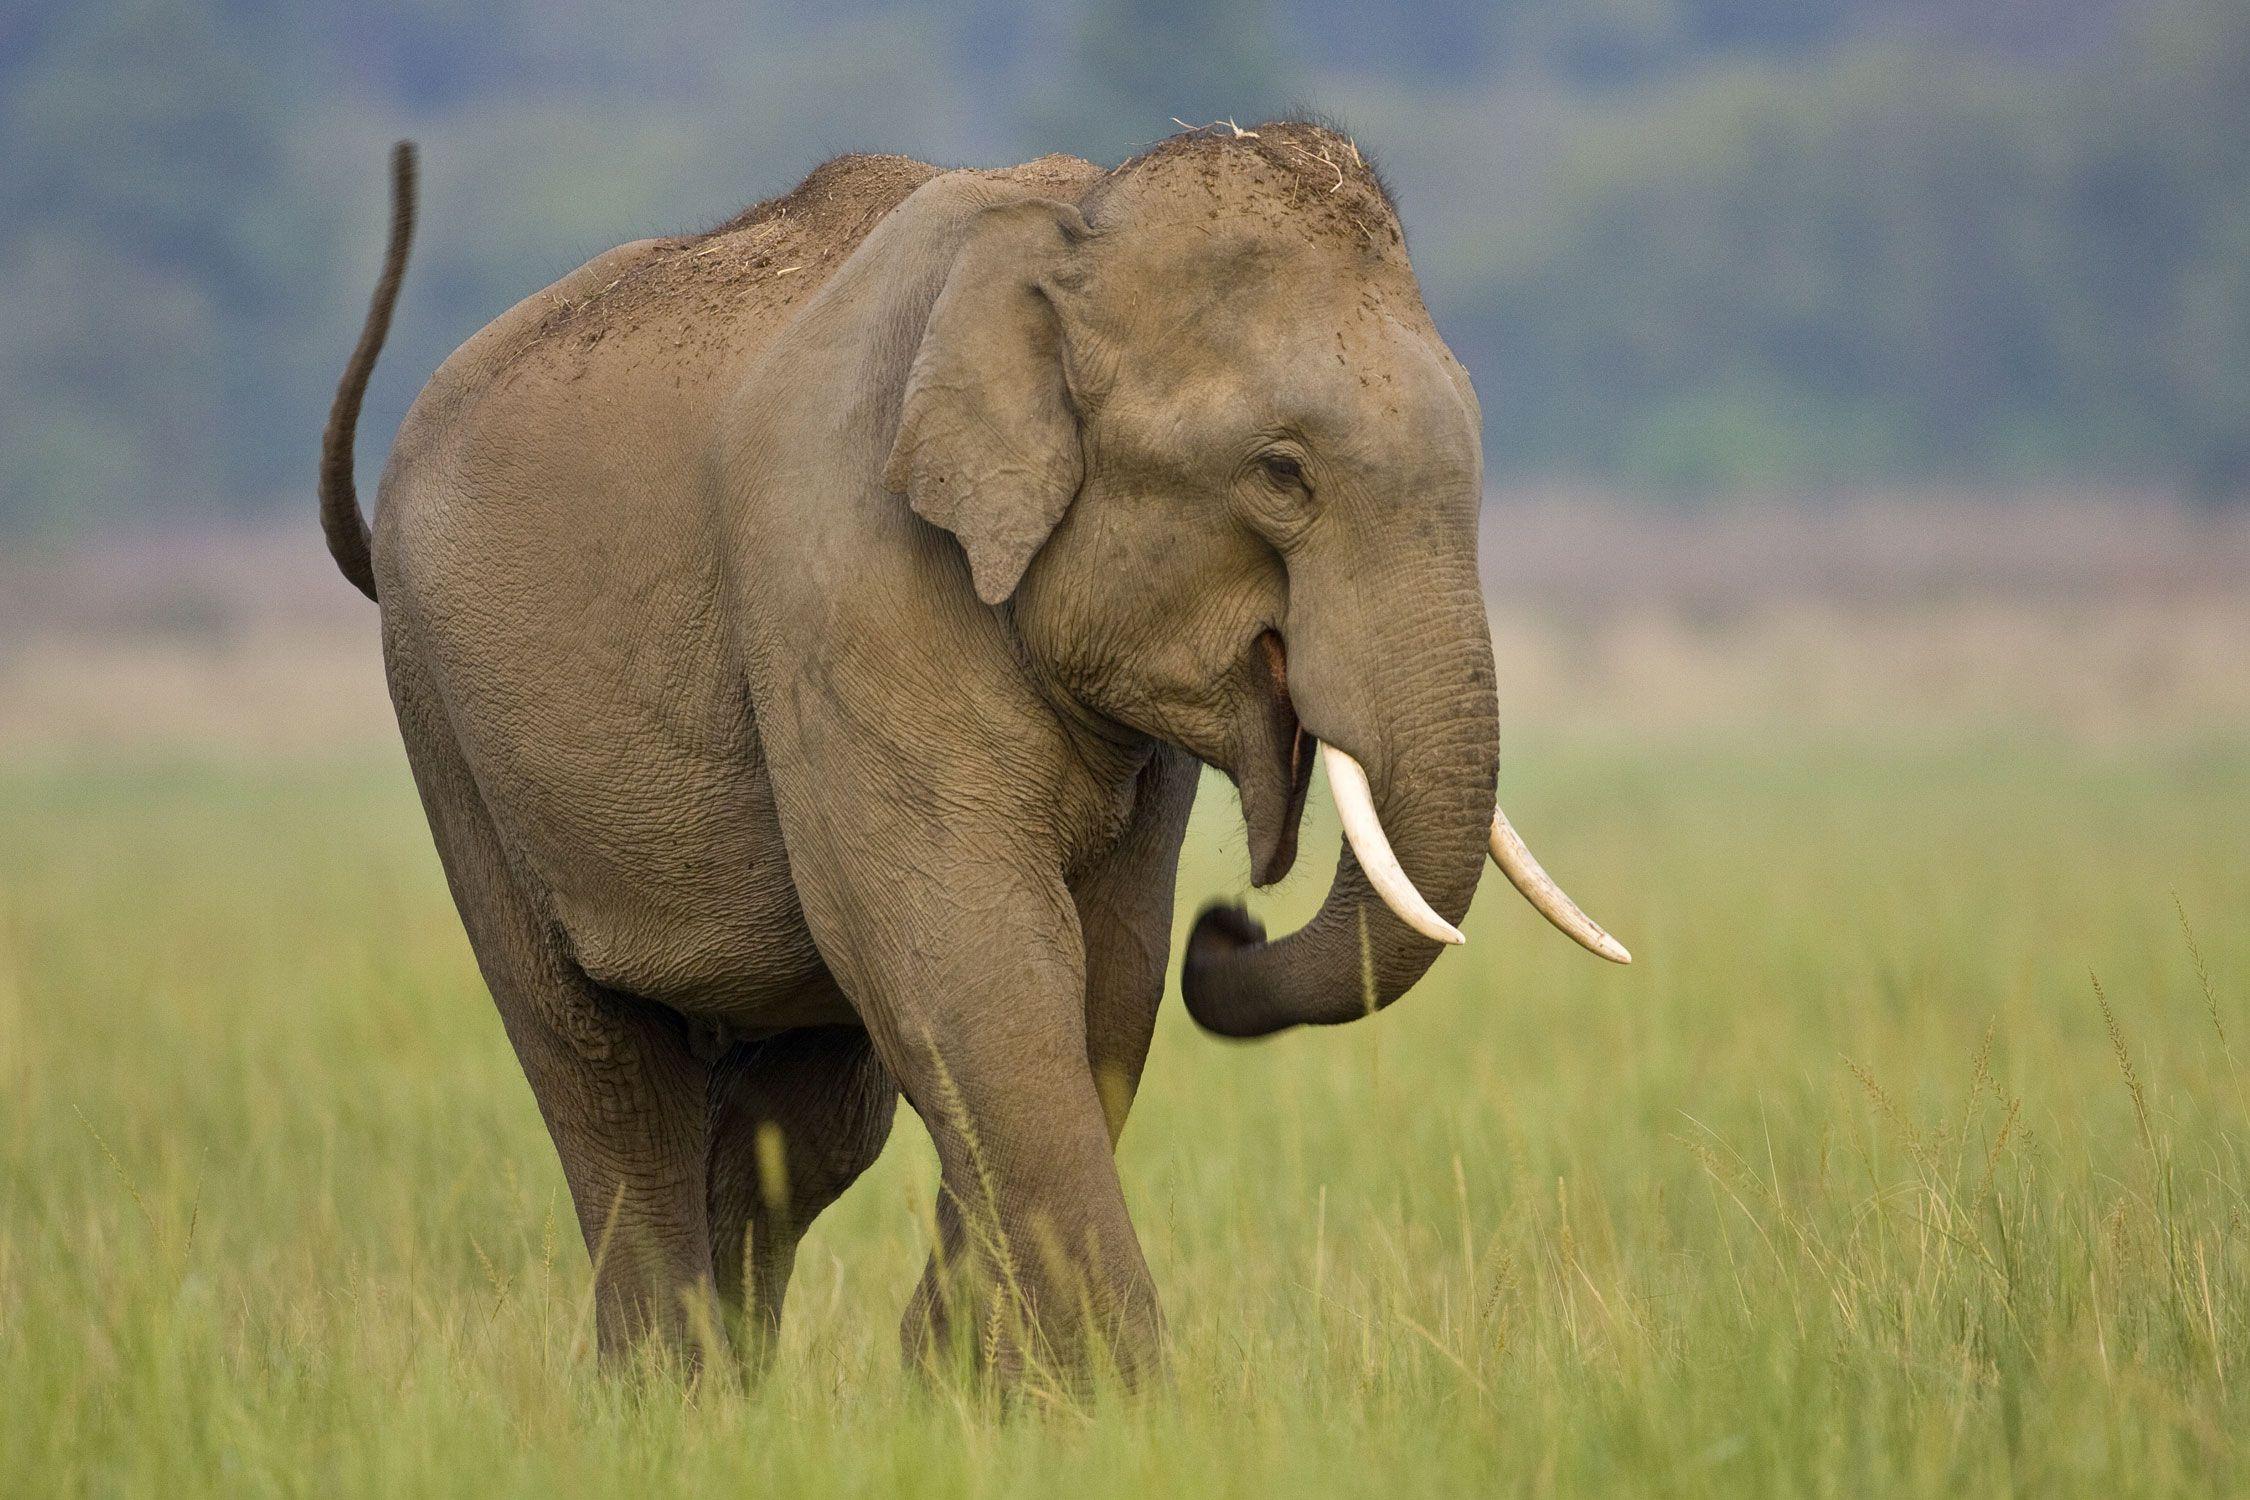 Asian elephant the elephants of india and southeast asia - Image elephant ...